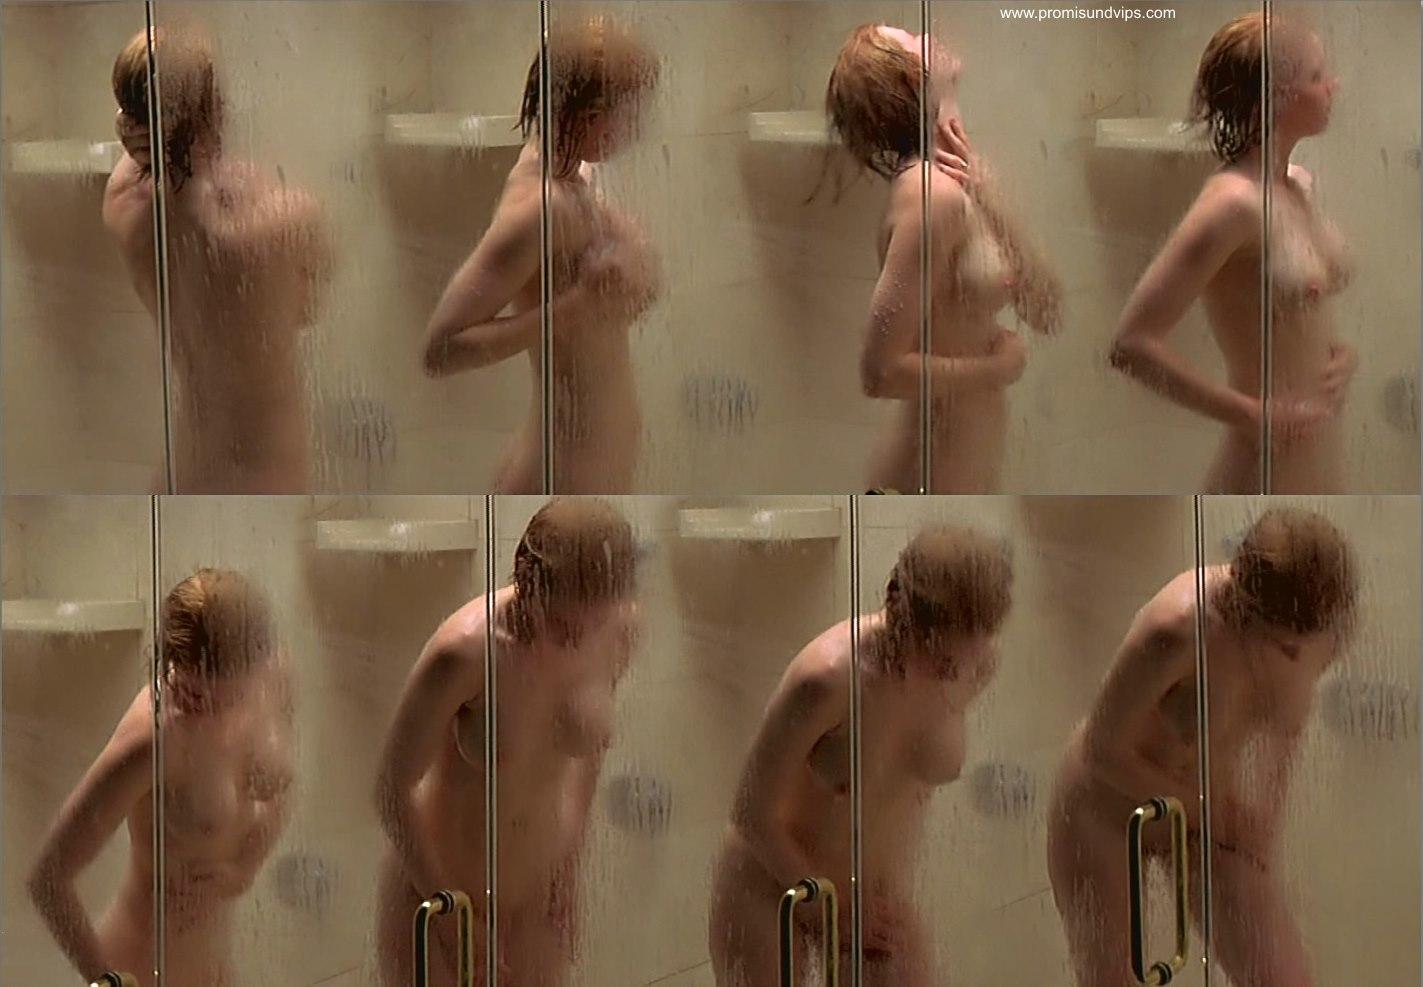 Nastassja Kinski Nude, Sexy, The Fappening, Uncensored